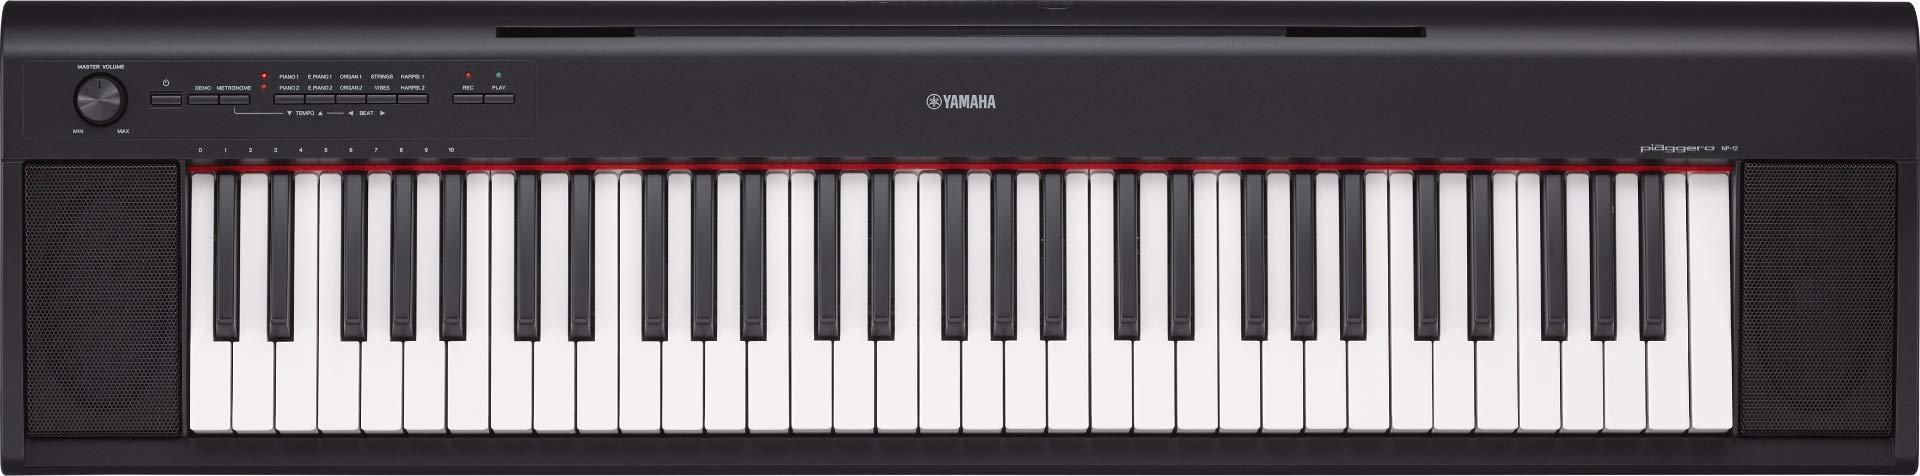 Yamaha NP-12 61-Key Entry-Level Digital Piano Keyboard W/Keyboard Survival Kit & Keyboard Stand & Bench by Yamaha (Image #2)